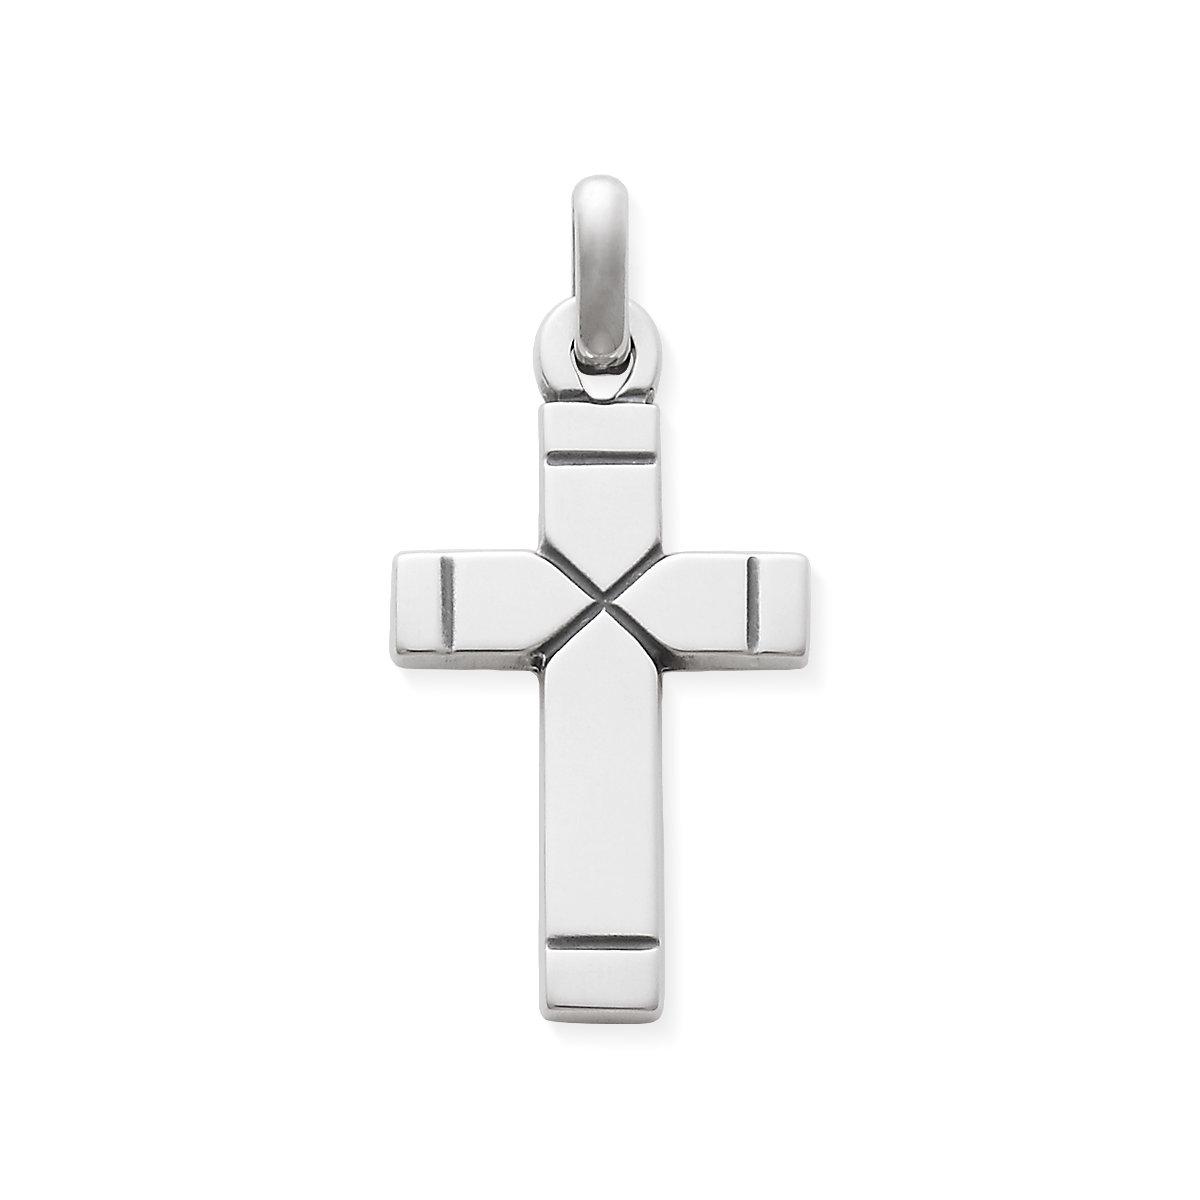 Chiseled cross pendant james avery plain latin cross medium aloadofball Image collections